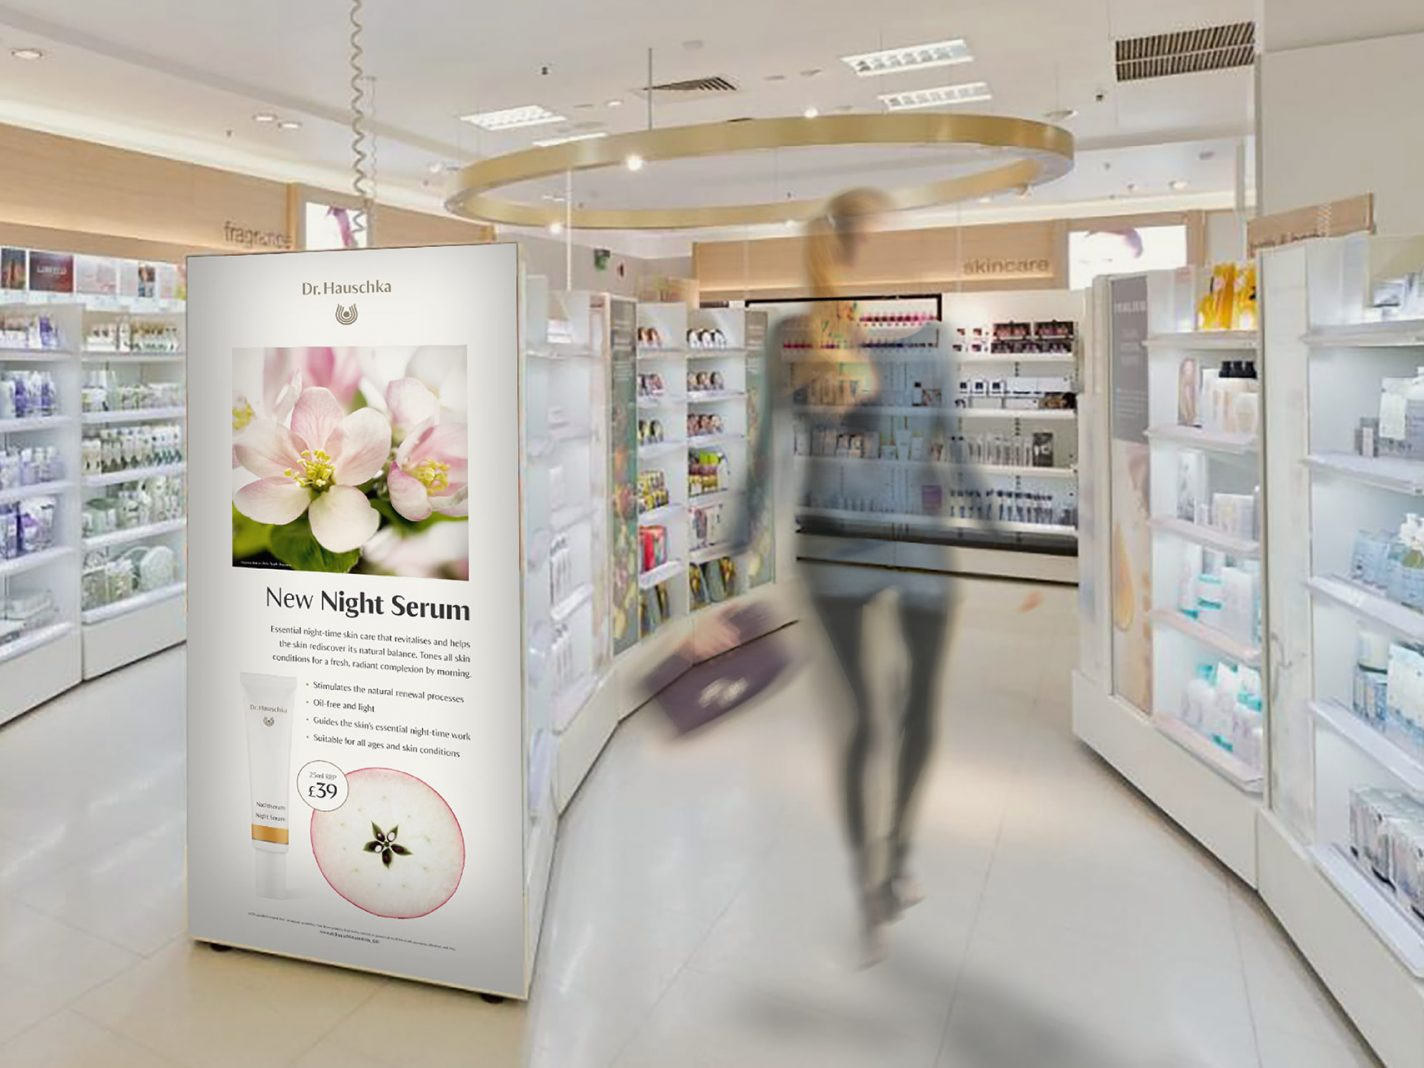 Dr. Hauschka Interior Store